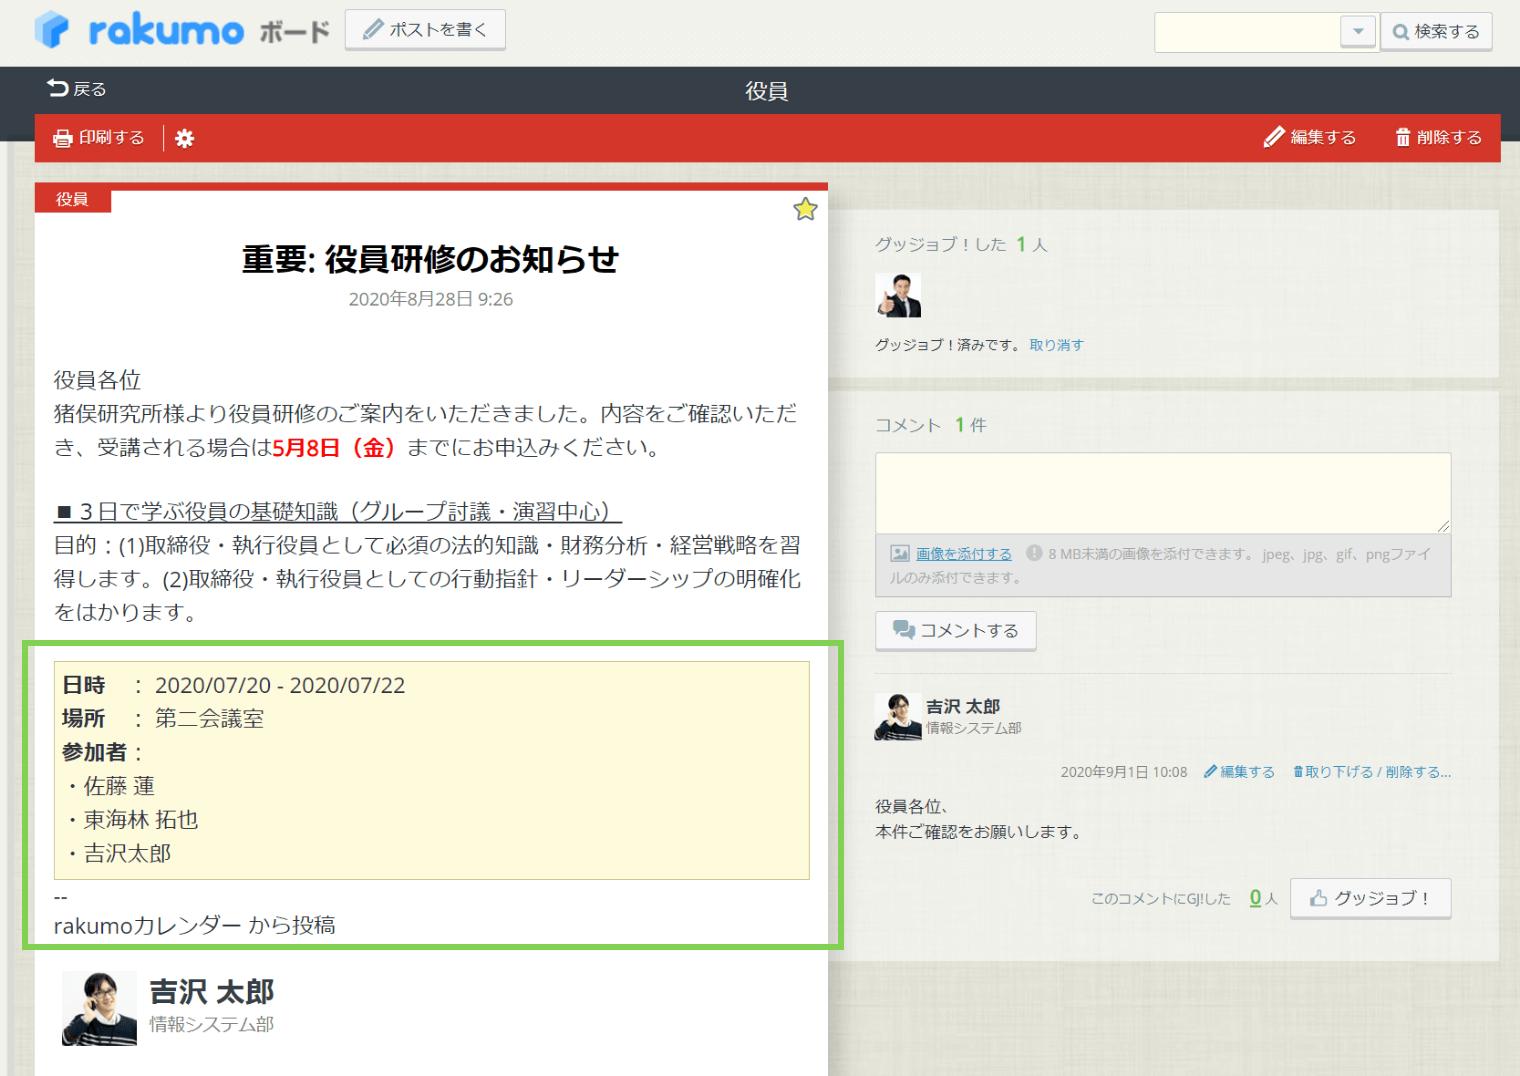 rakumo ボード カレンダー連携後の投稿